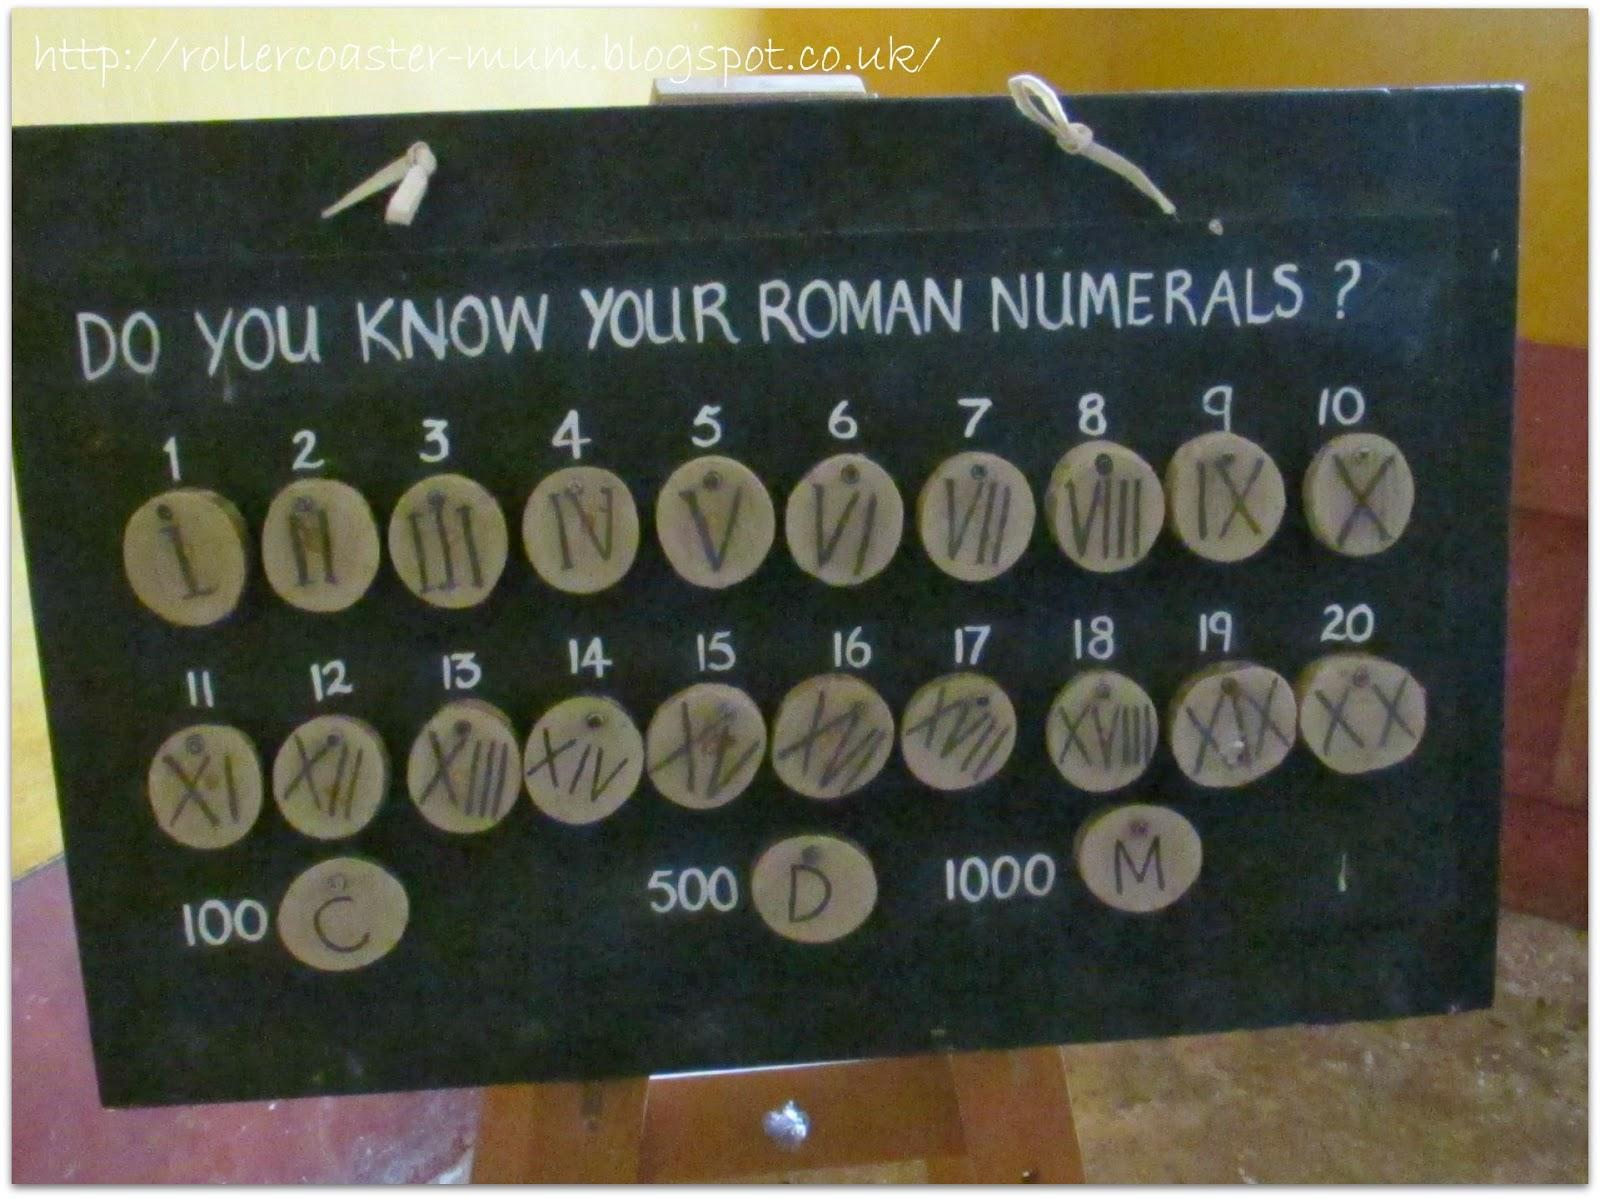 Roman numeral converter, Butser Ancient Farm